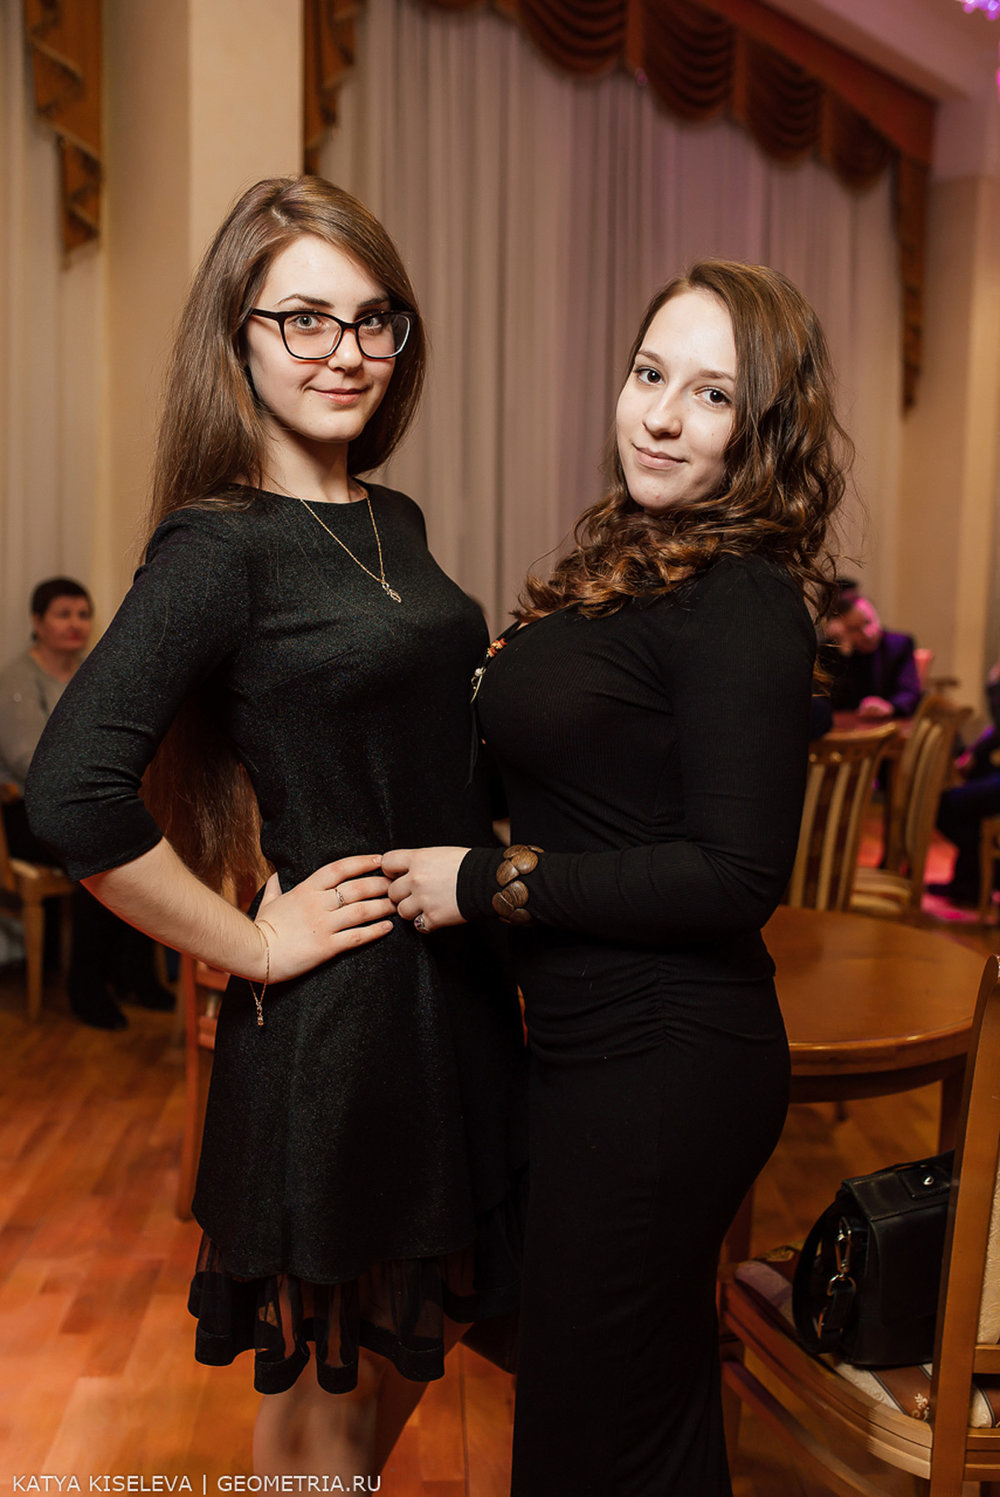 013_2018-02-14_19-03-32_Kiseleva.jpg